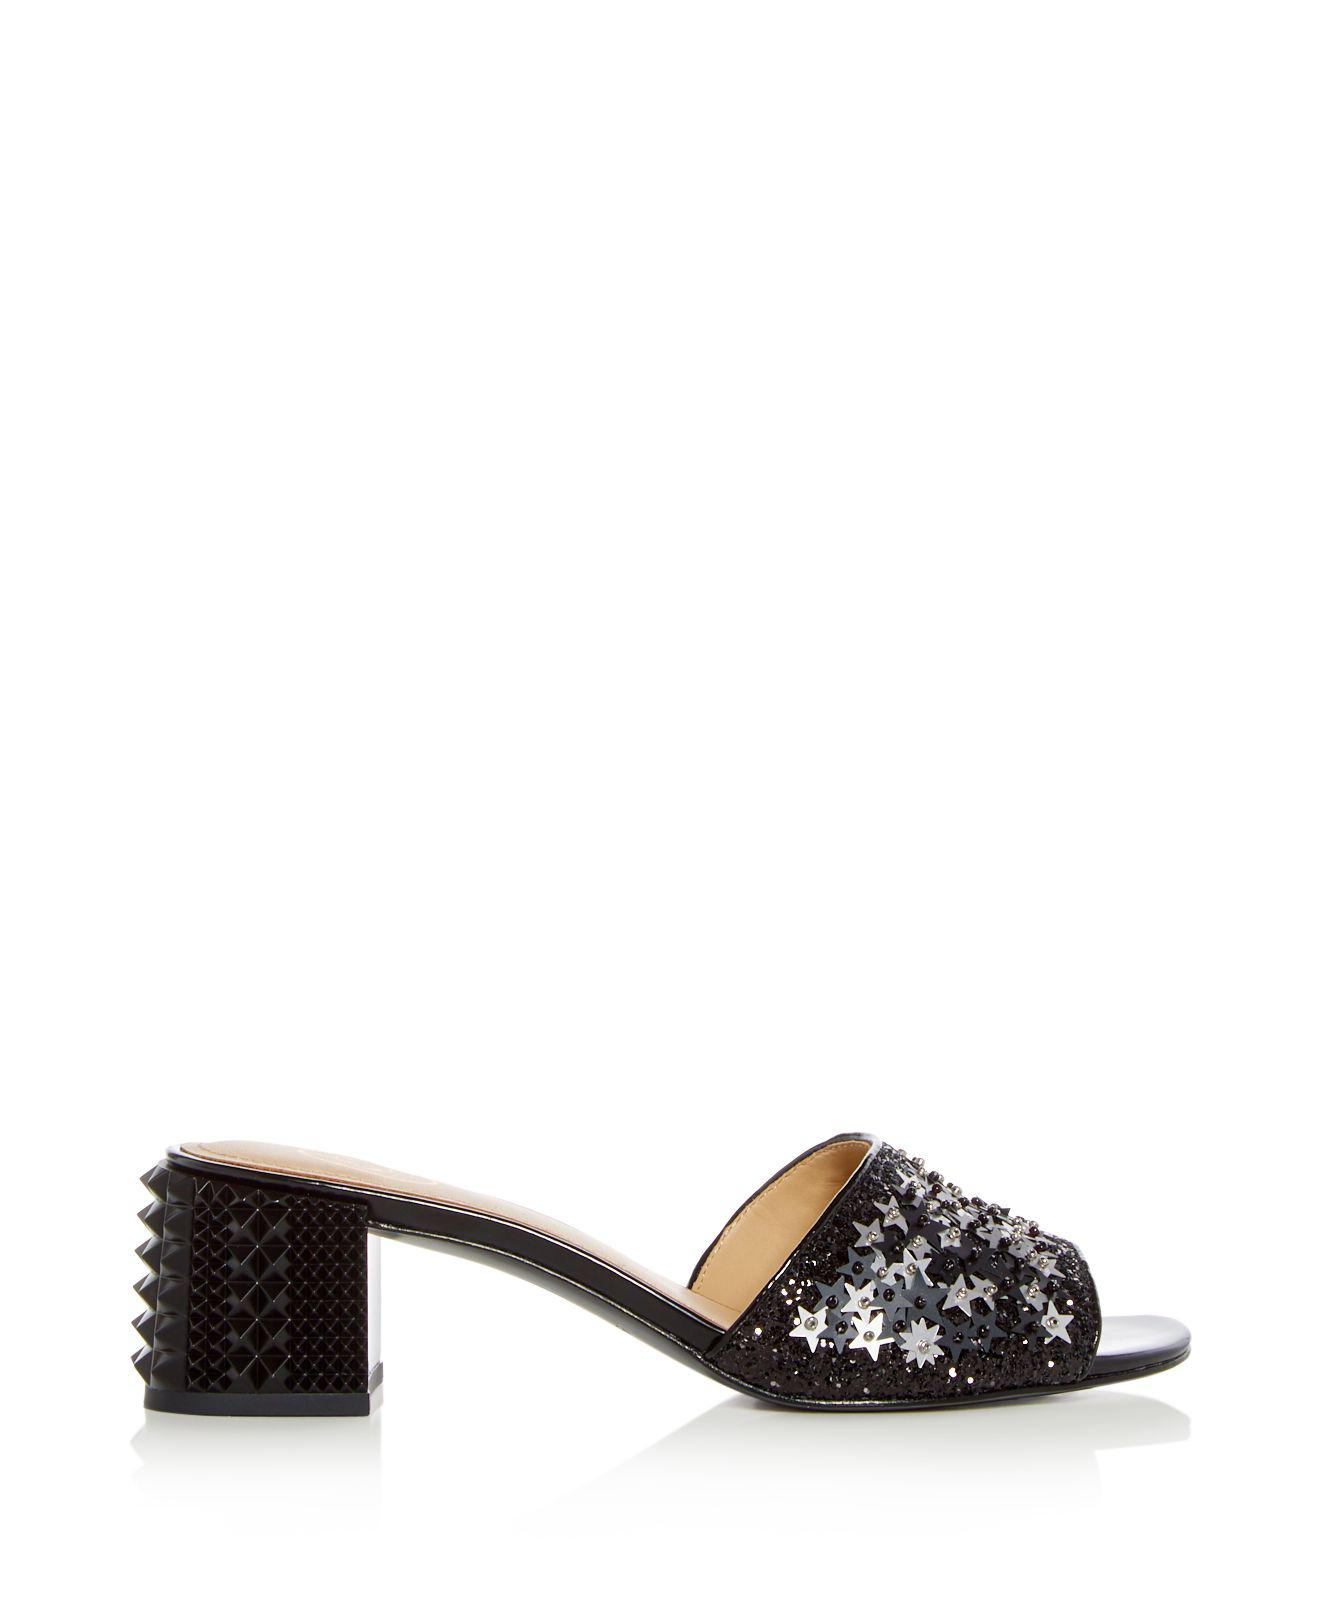 Ash Women's Ruby Star Embellished Block Heel Slide Sandals zvIqw